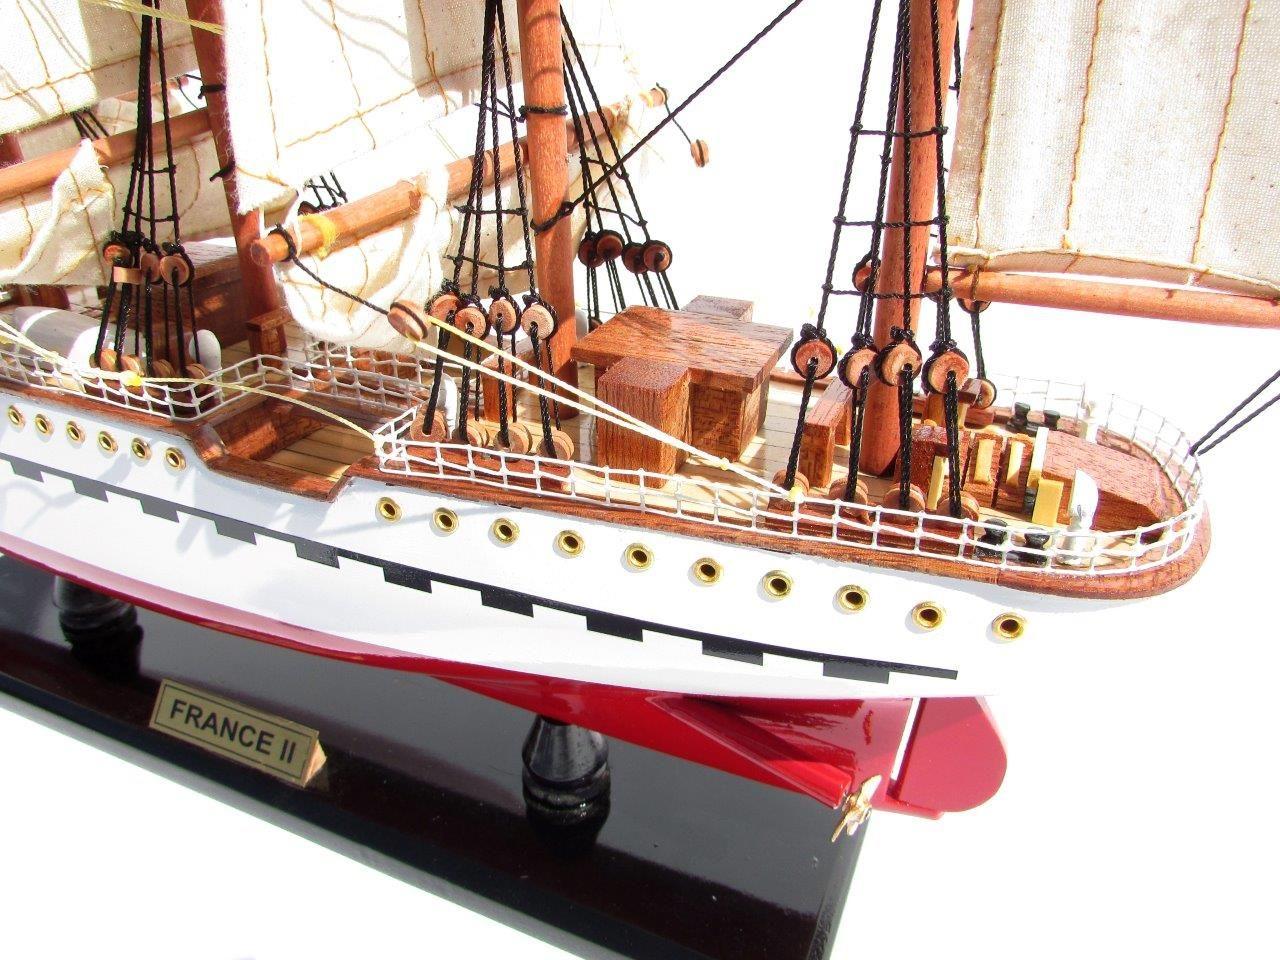 2045-12085-France-II-Wooden-Model-Ship